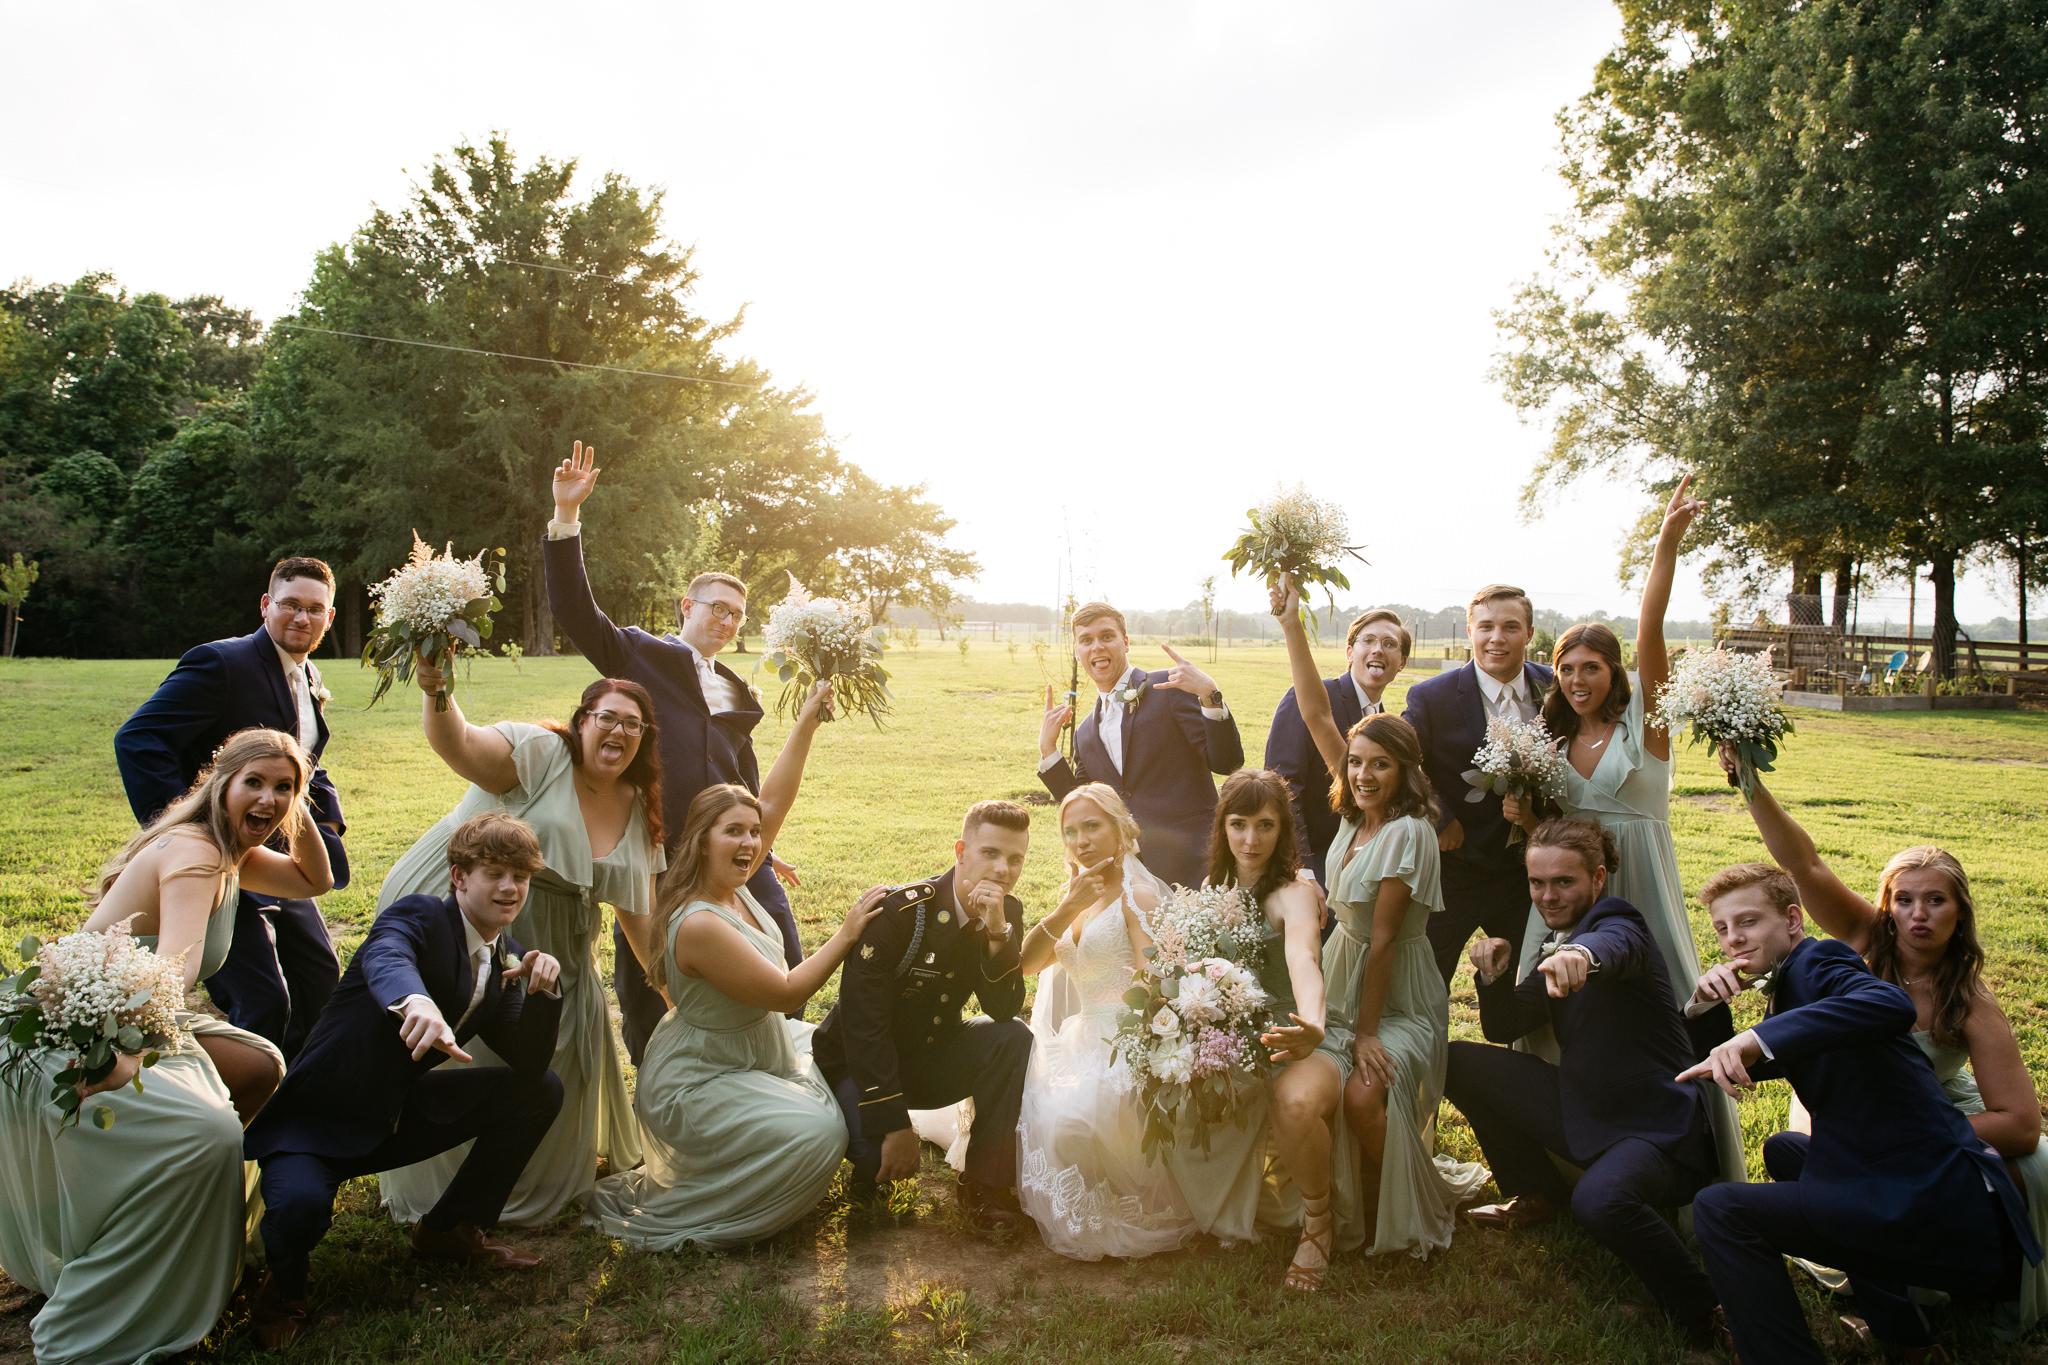 backyard-wedding-thewarmtharoundyou-lexy-branson-102.jpg